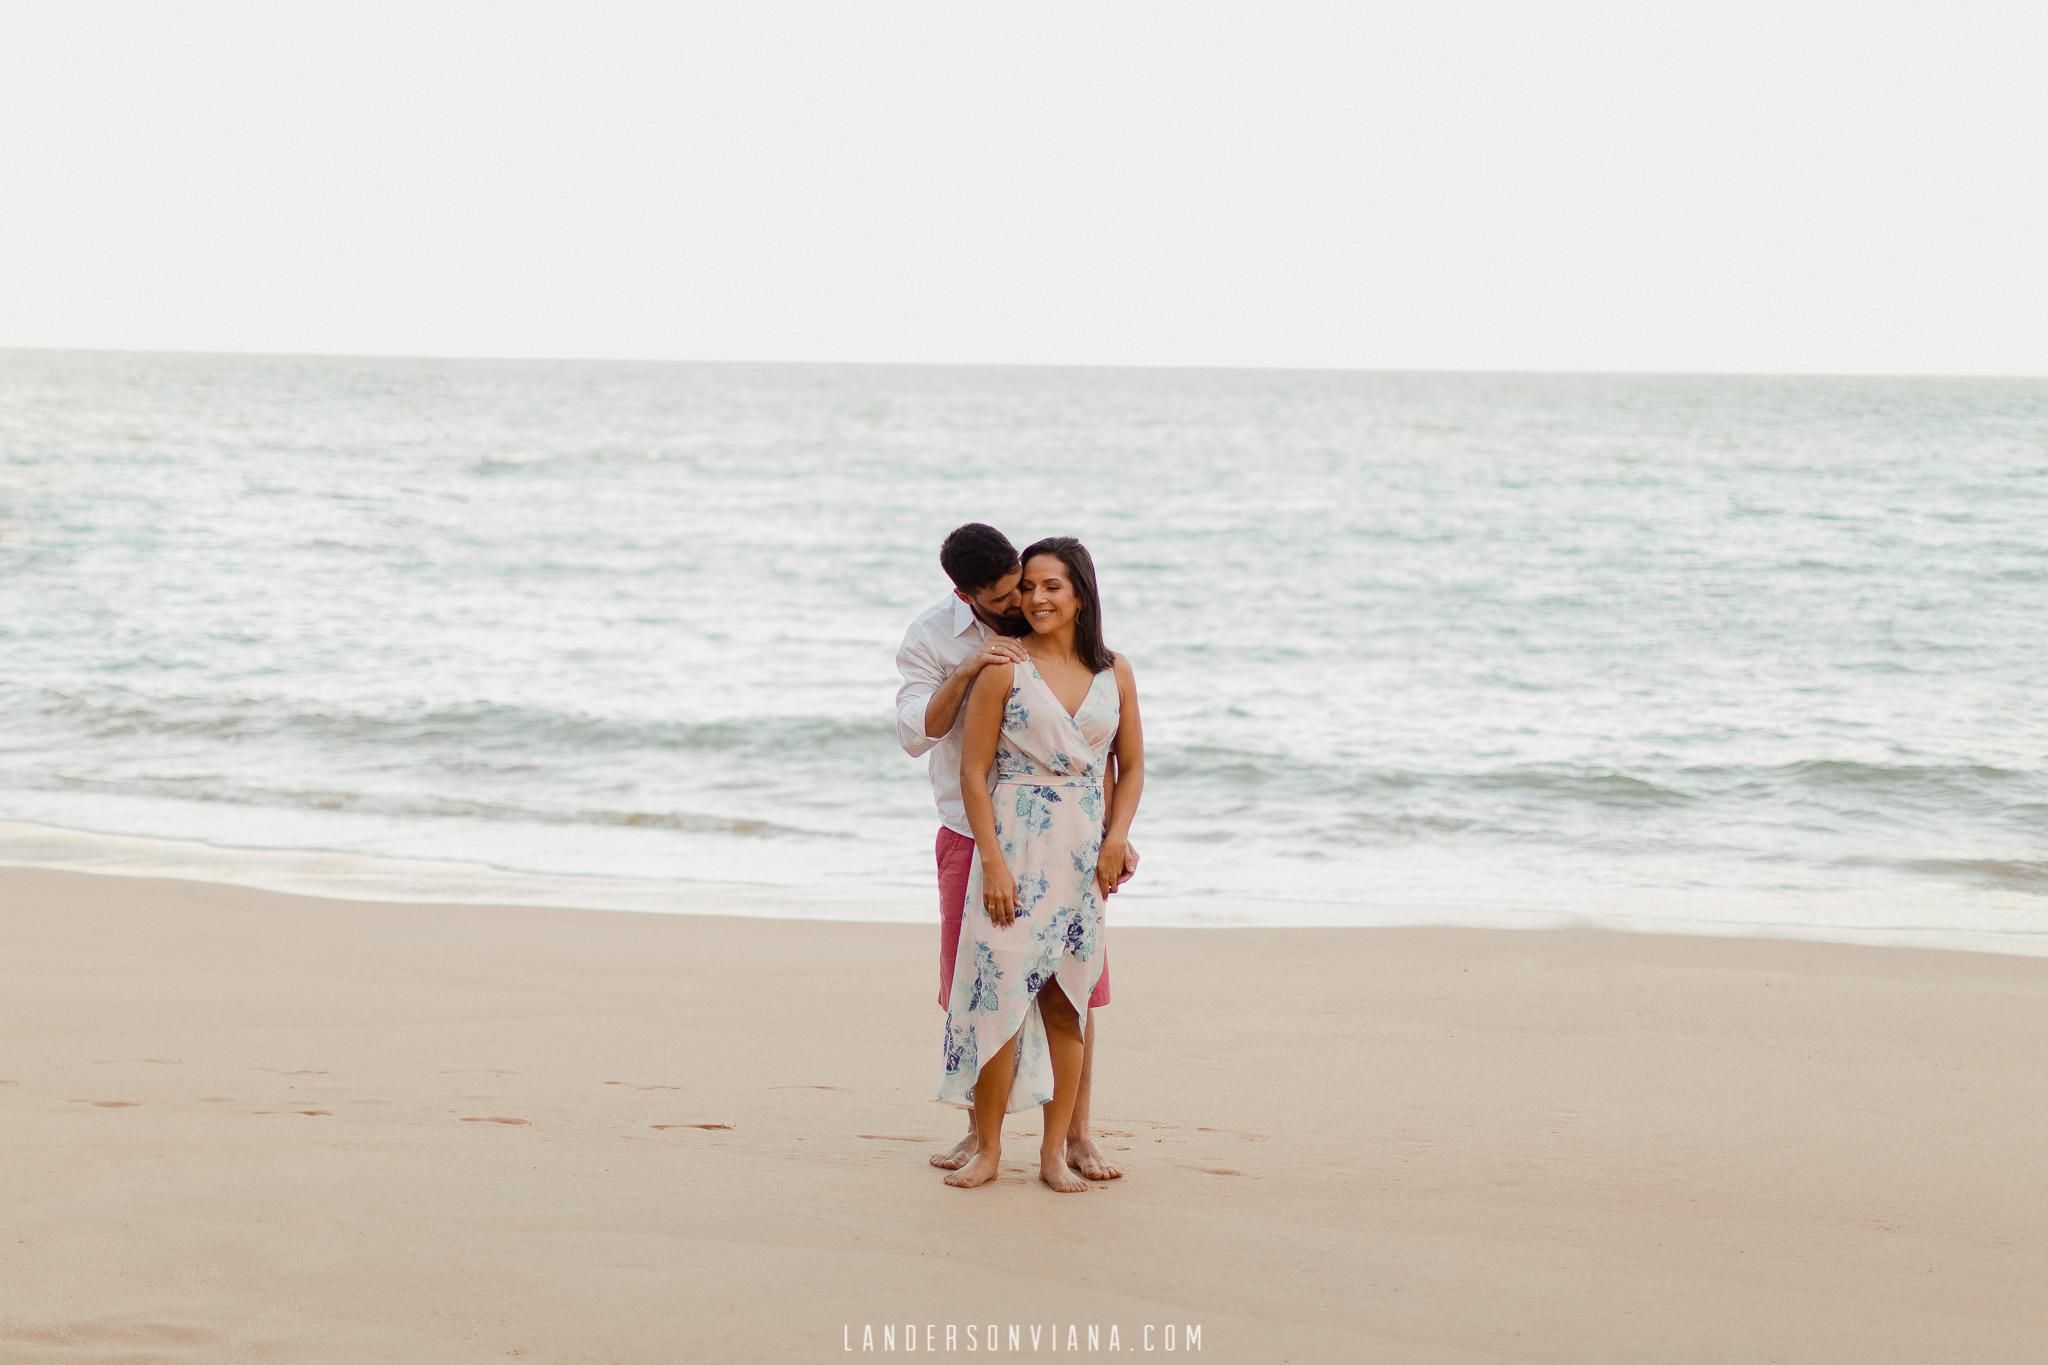 ensaio-pre-wedding-praia-landerson-viana-fotografia-casamento-pegueiobouquet-13.jpg